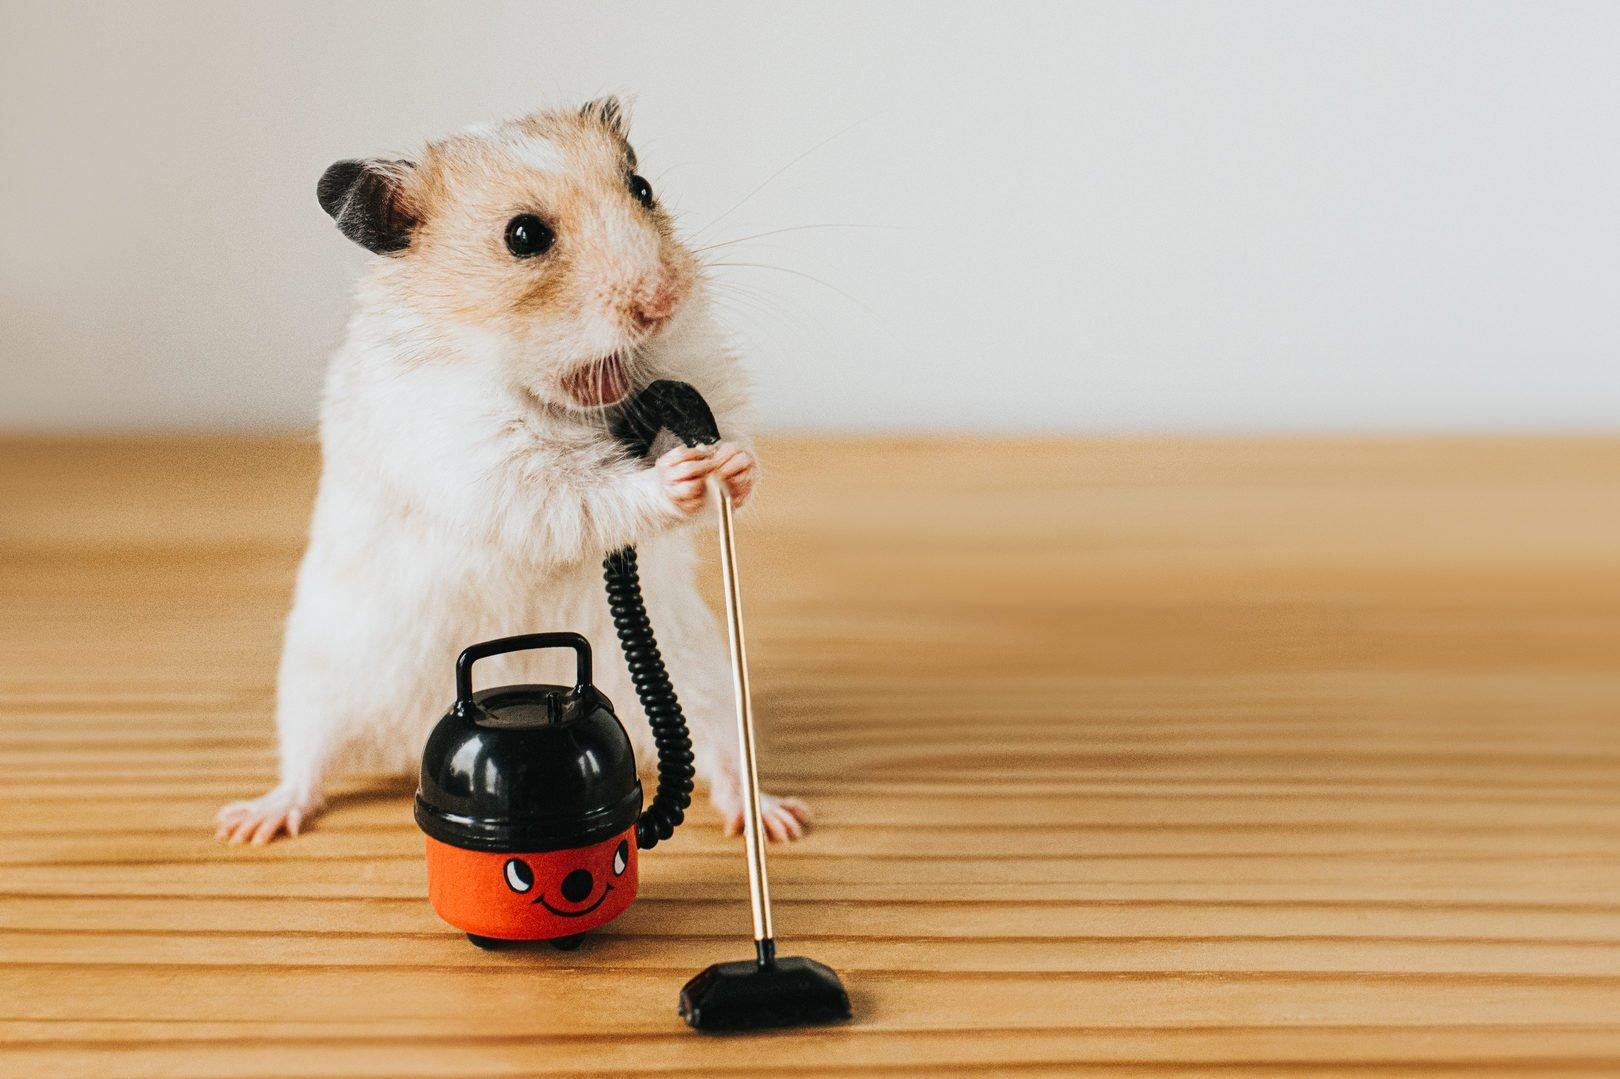 Hamster Vacuuming